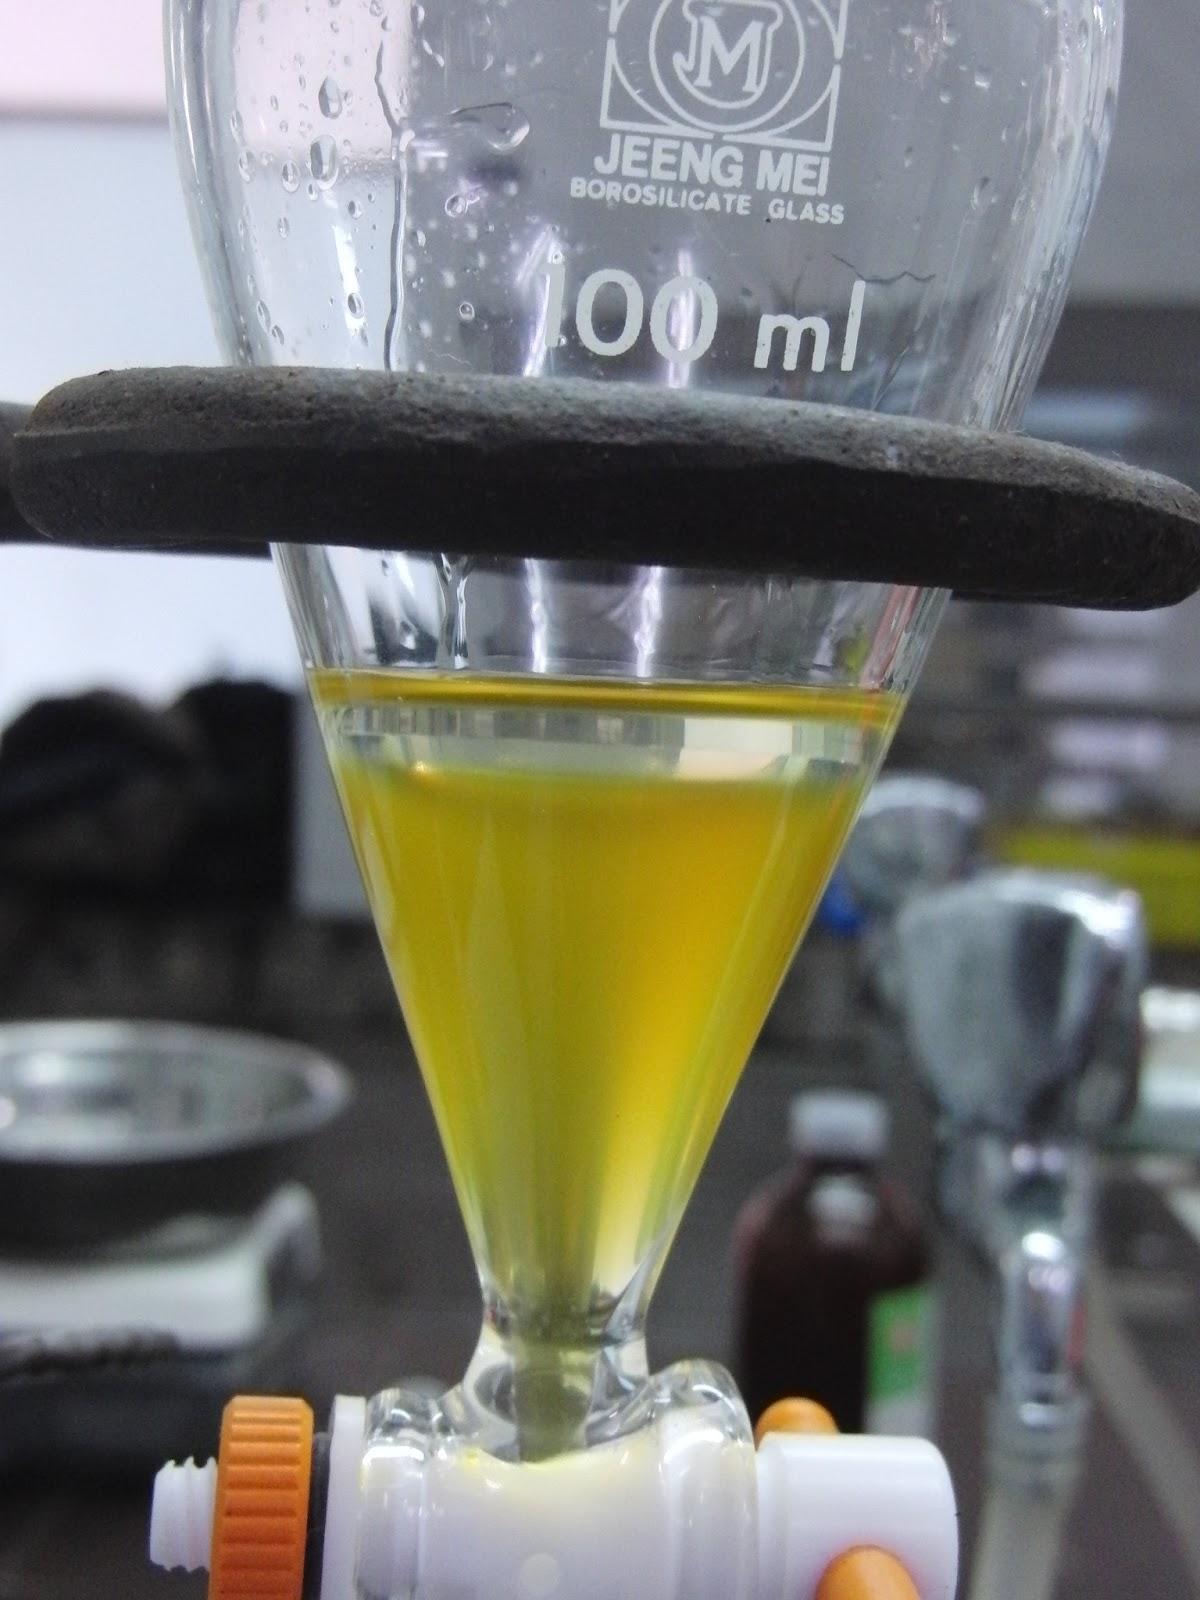 1Bromo3methyl butane supplier  CasNO107824